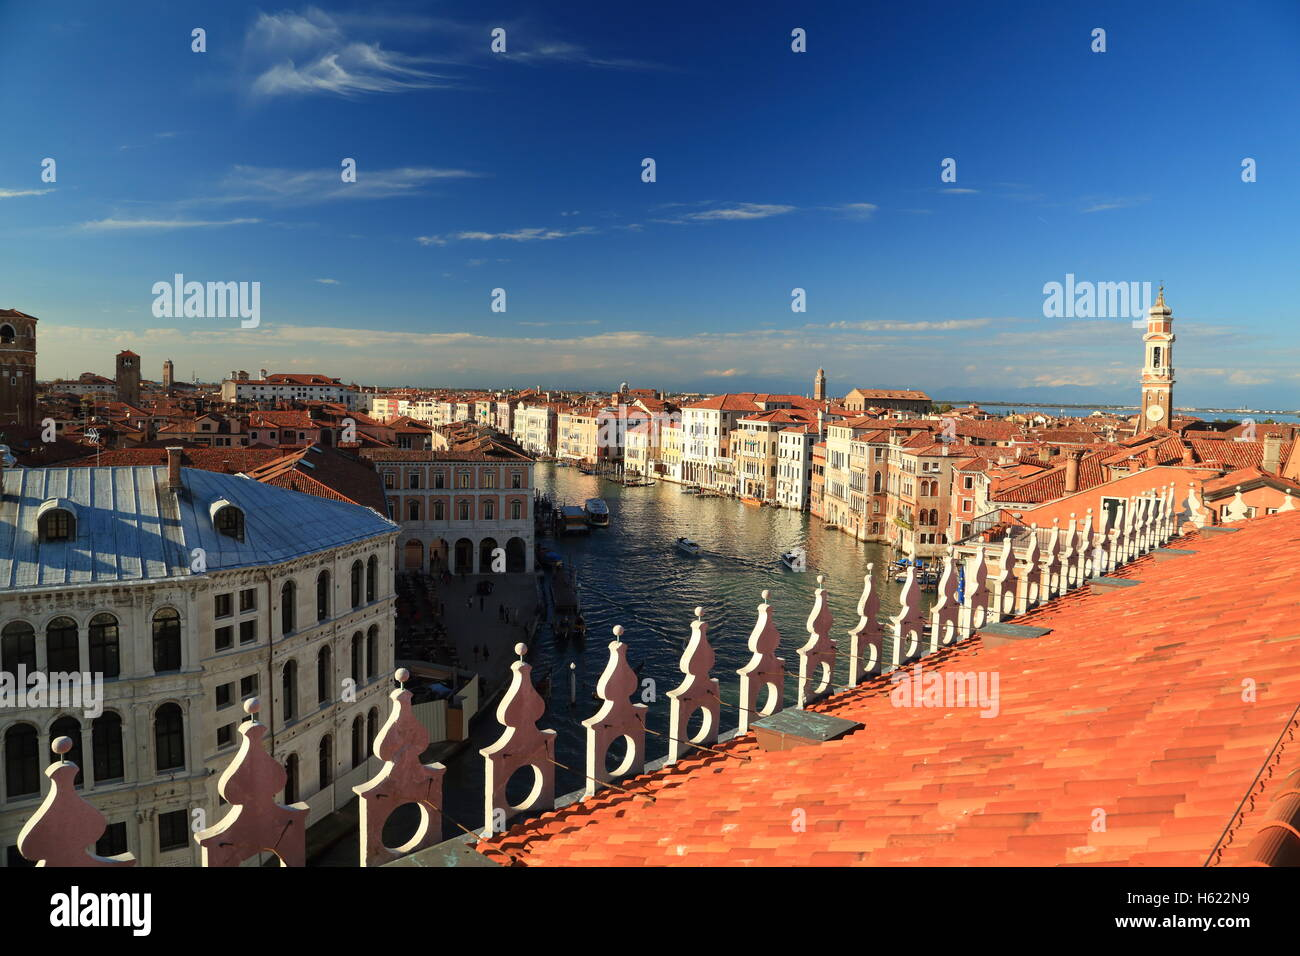 Roof terrace of the luxury shopping center Fondaco dei Tedeschi in Venice. - Stock Image